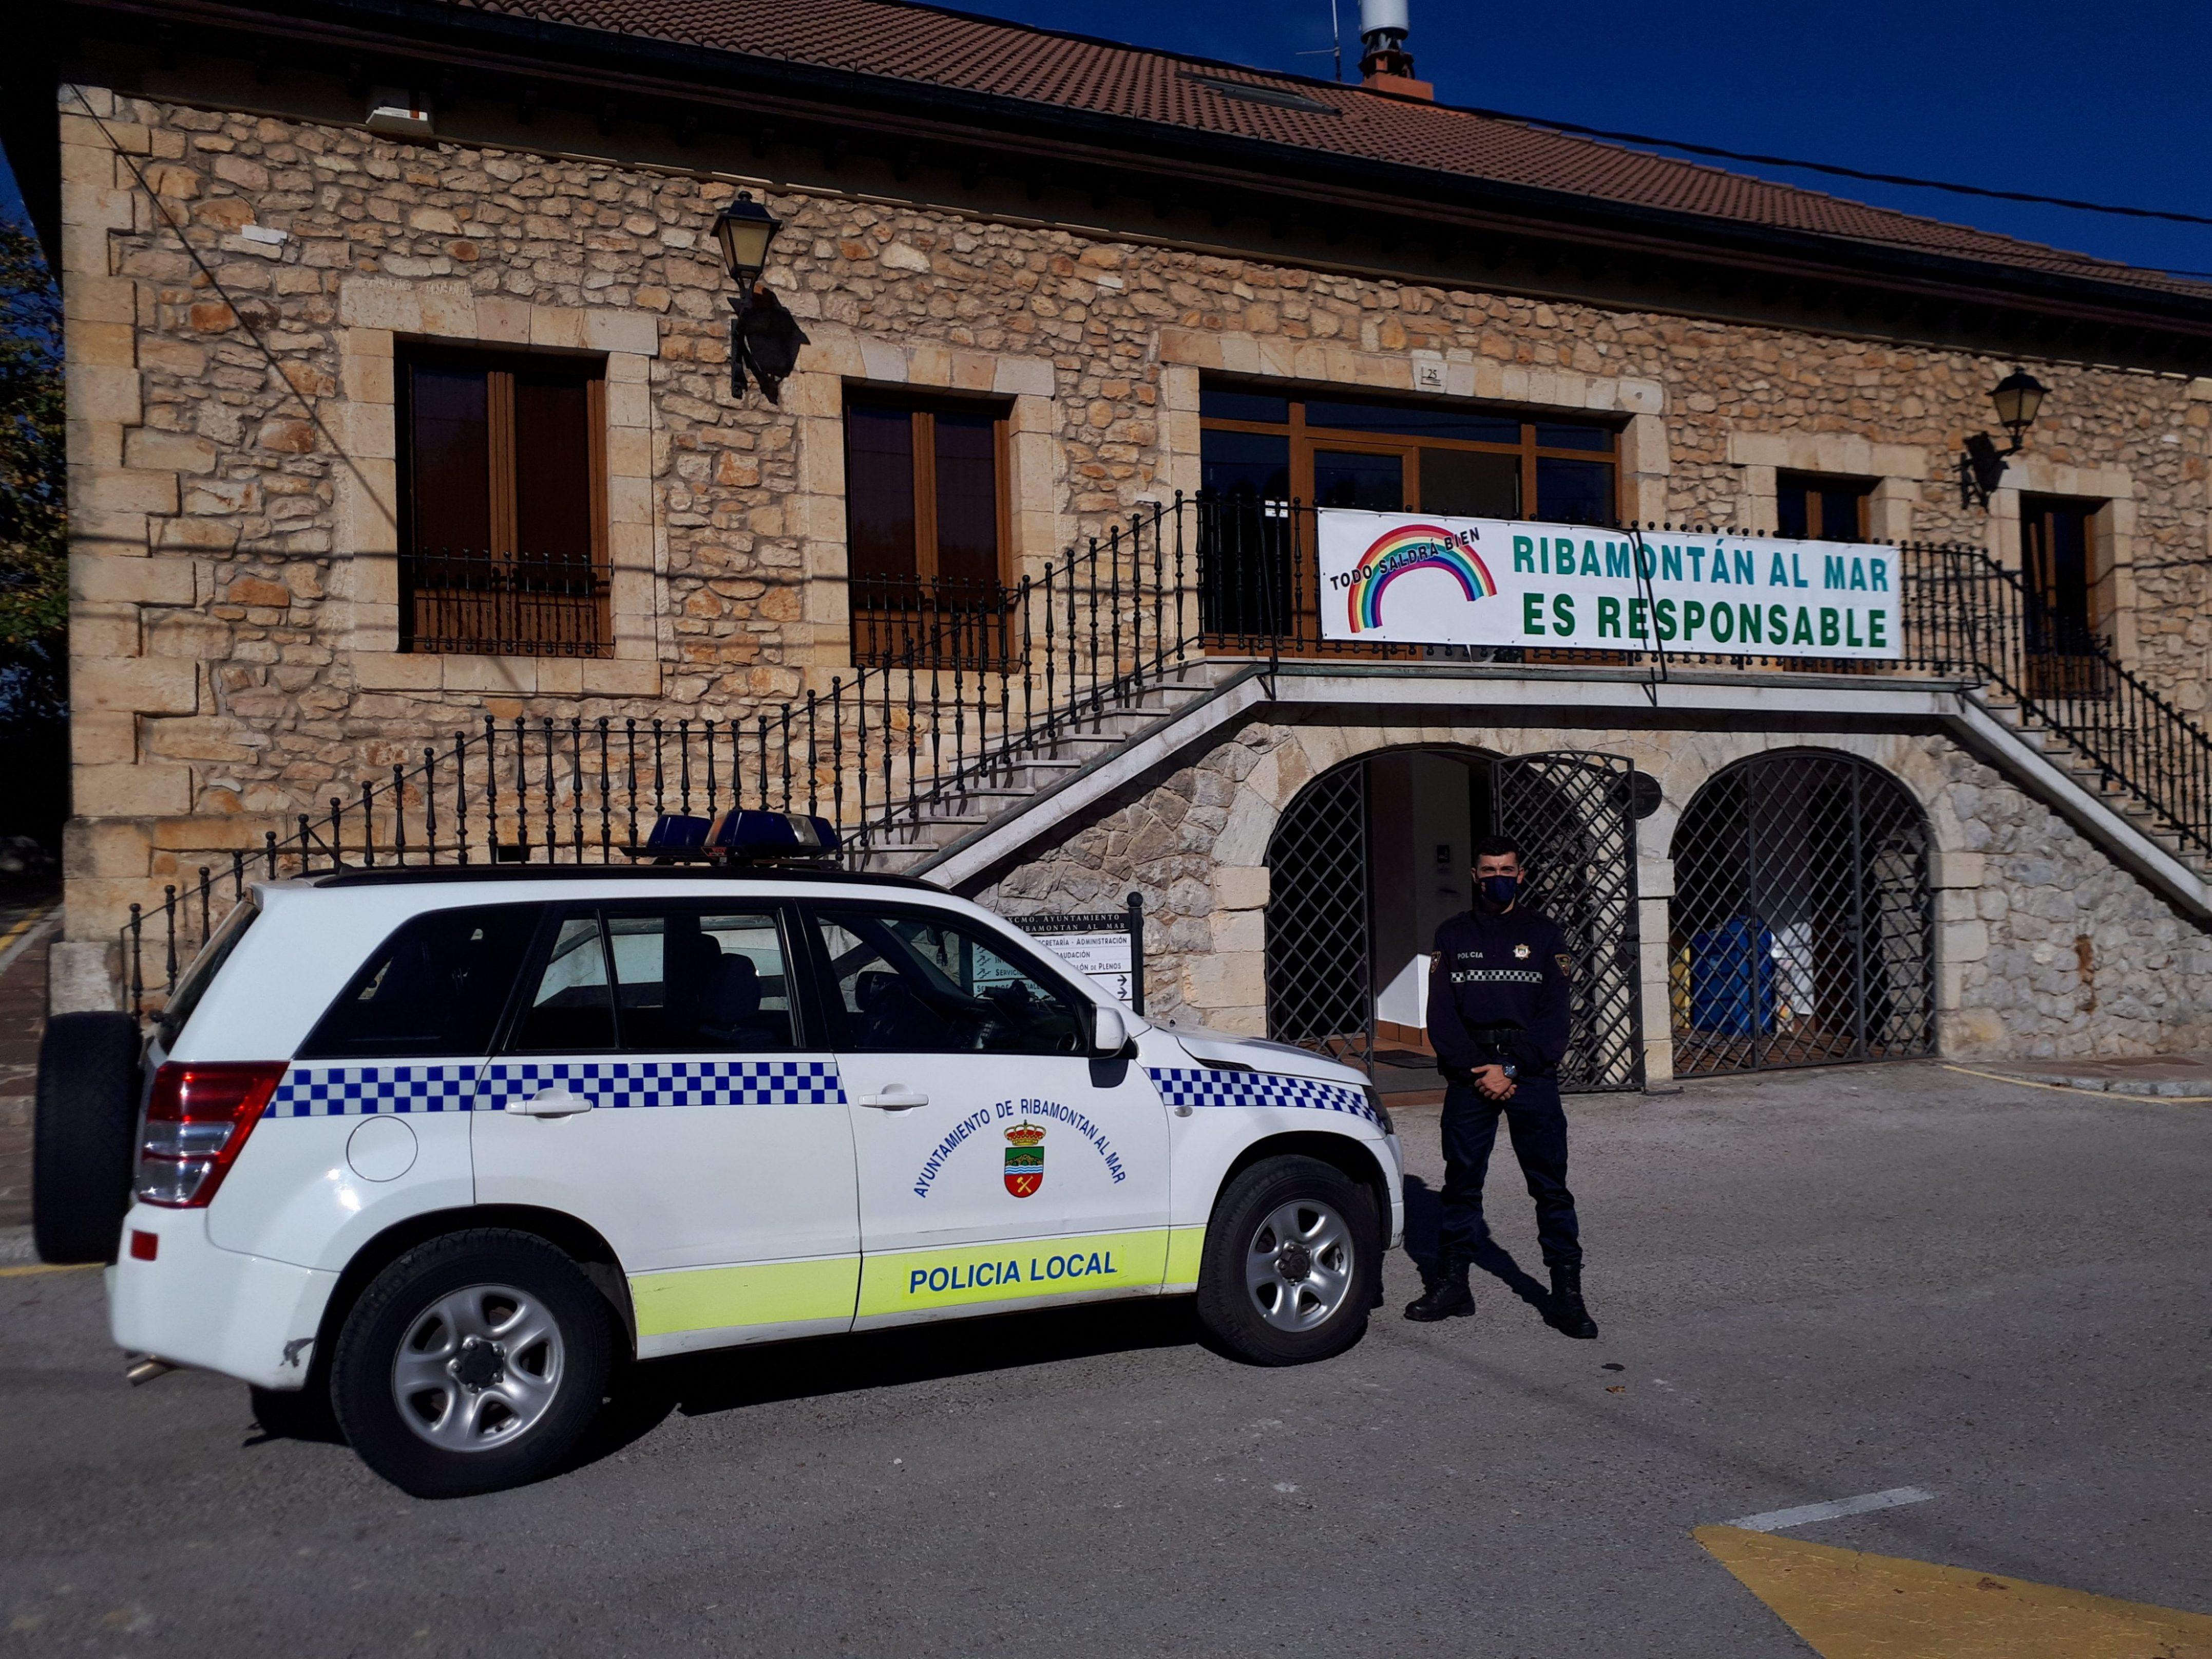 INICIO PABLO POLICIA